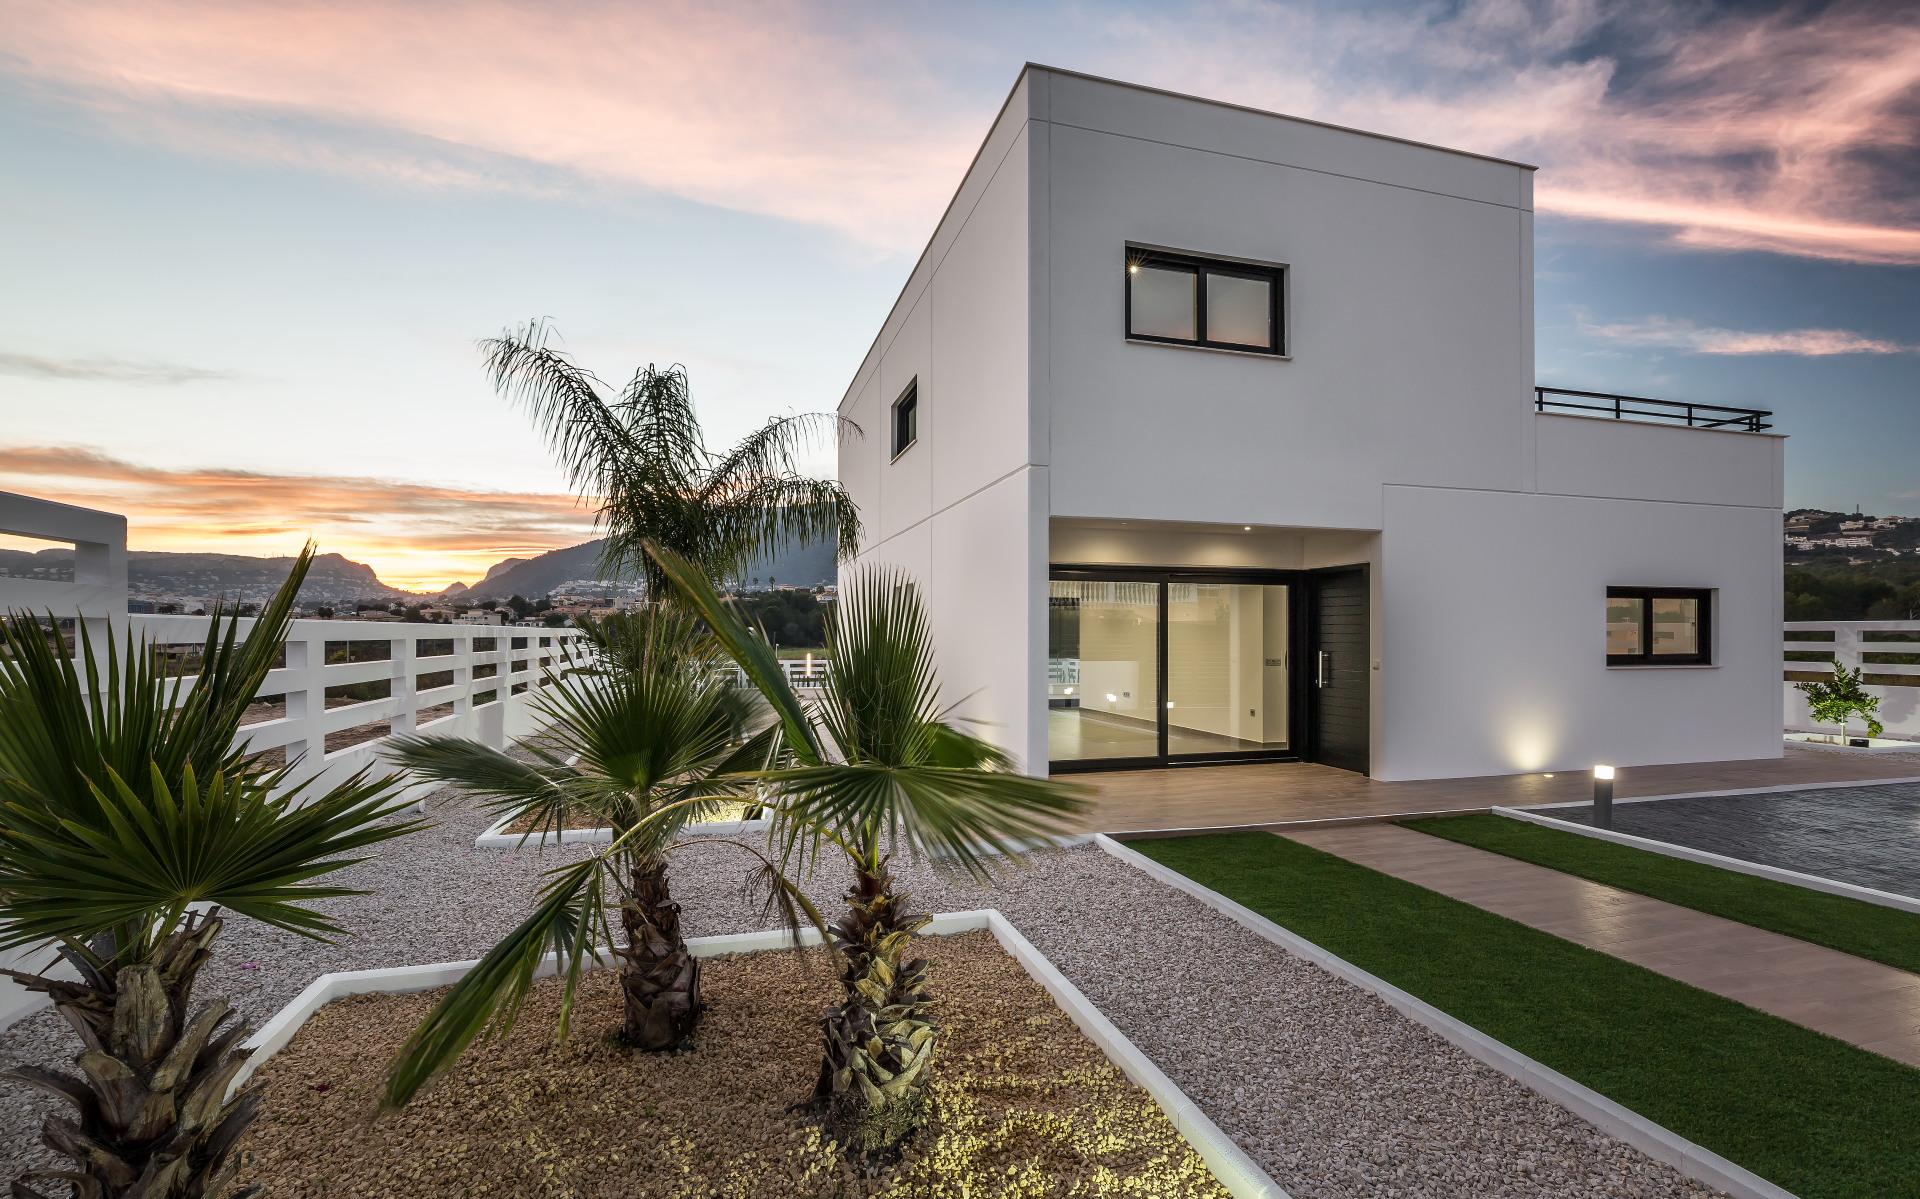 fotografia-arquitectura-valencia-german-cabo-viraje-vivienda-unifamiliar-calpe (44)